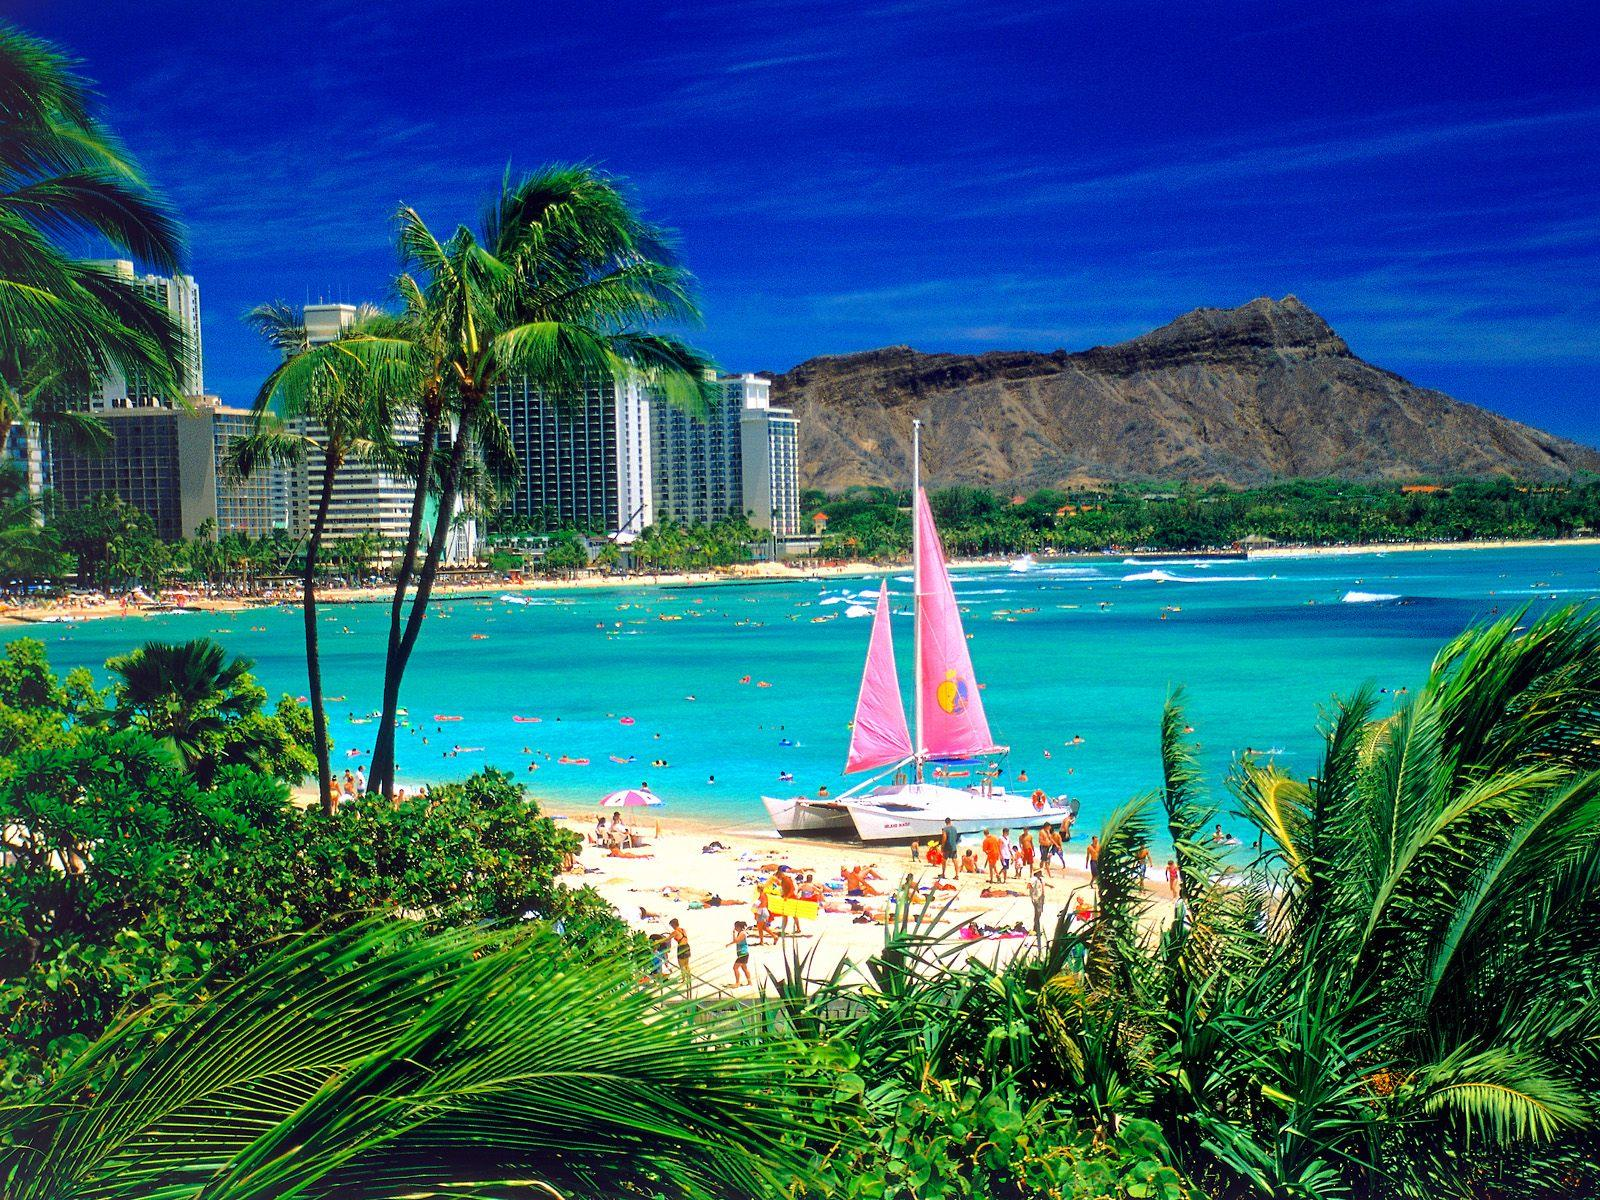 Hawaii Islands HD Wallpaper Background Images 1600x1200